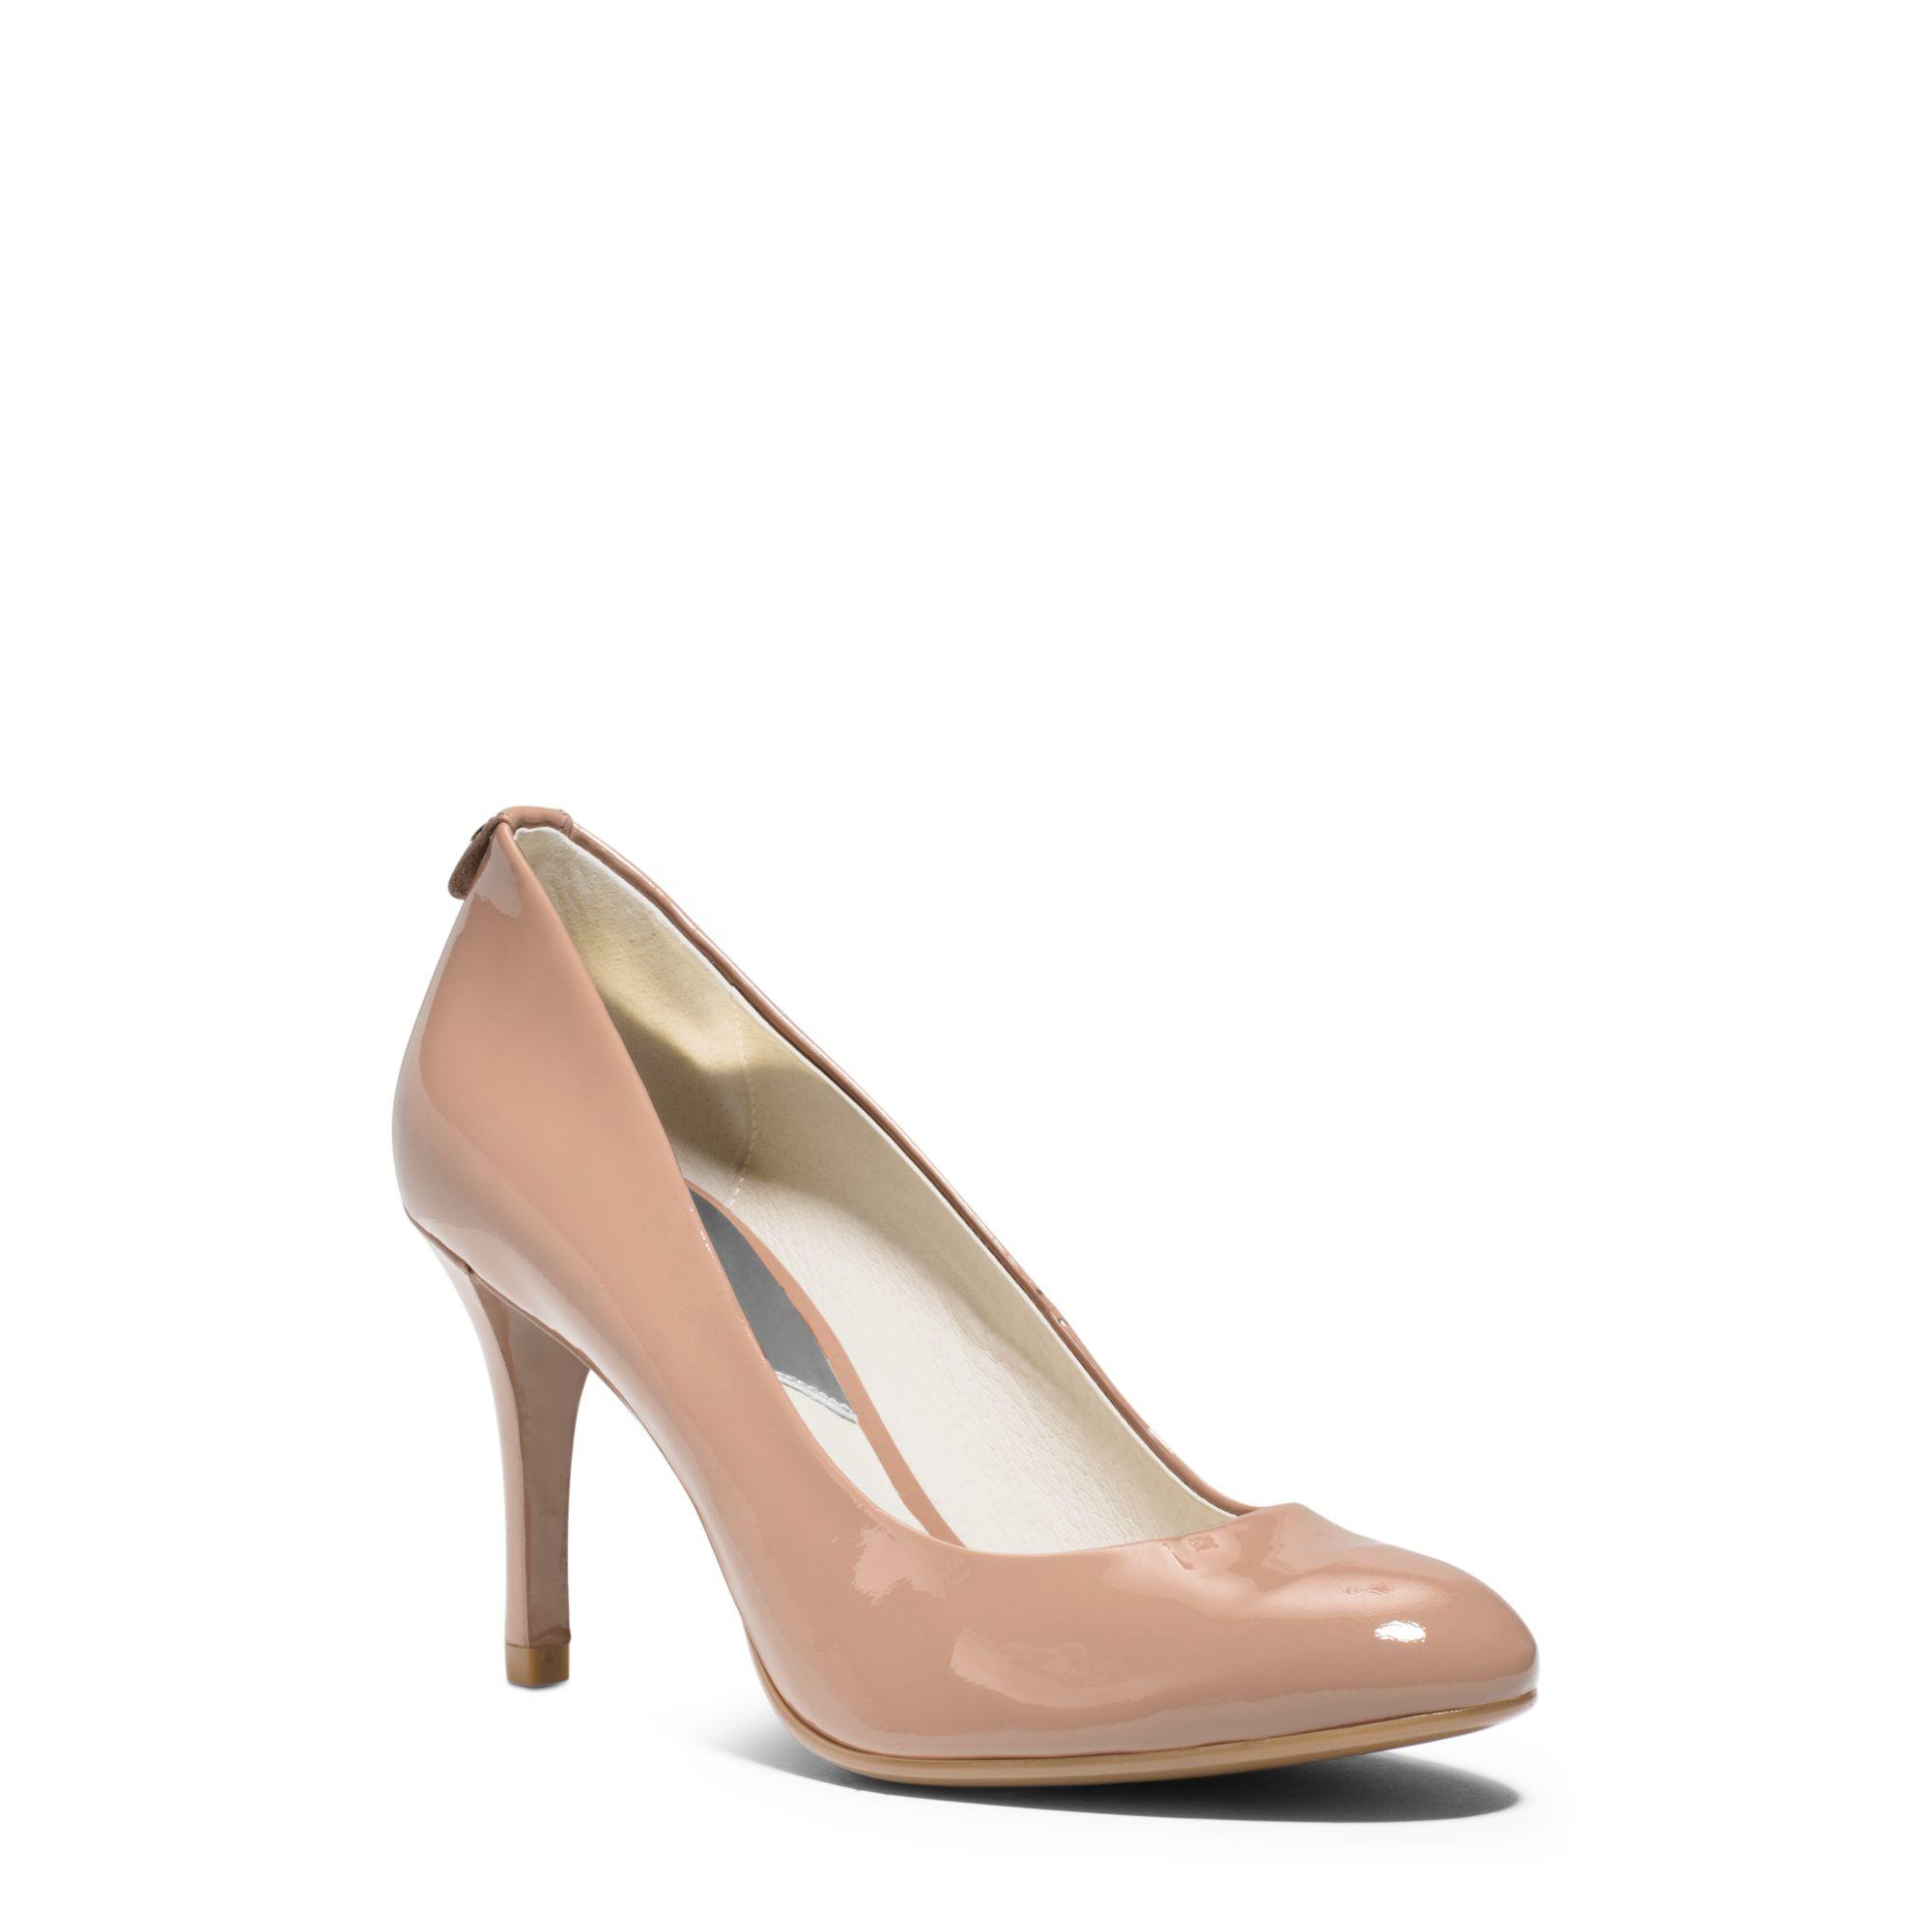 Lyst - Michael Kors Flex Patent-Leather Mid-Heel Pump In Pink-3386